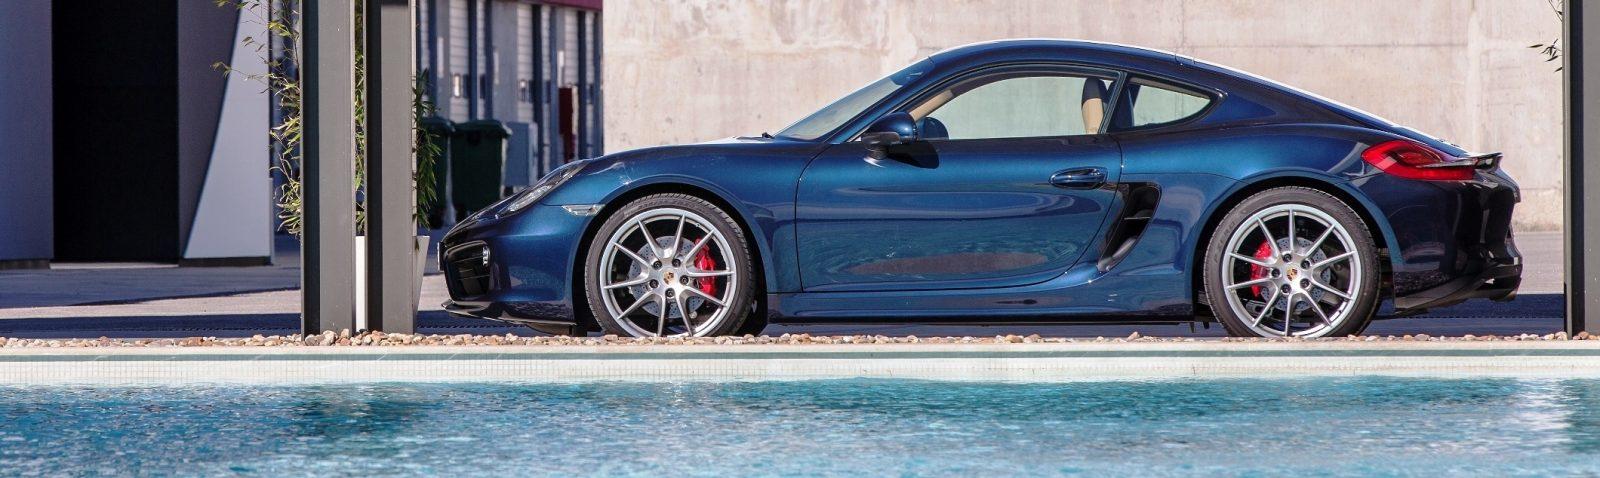 CarRevsDaily - Porsche CAYMAN Buyers Buide Photos 18